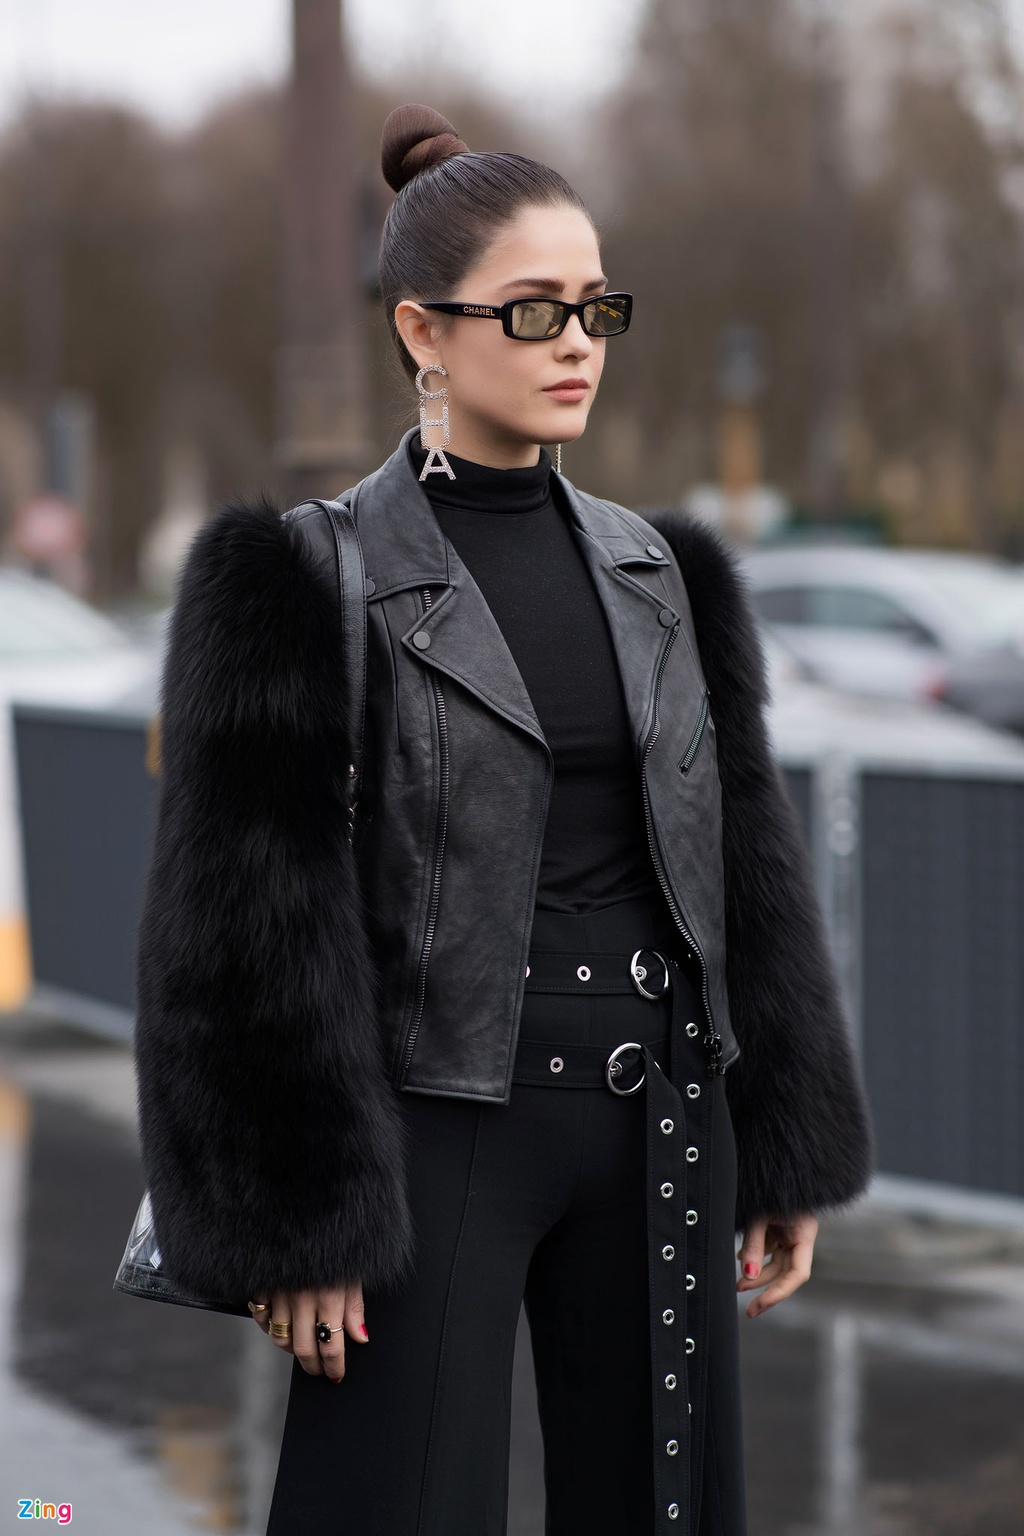 Khong khi nhon nhip truoc them show Chanel cuoi cua Karl Lagerfeld hinh anh 13